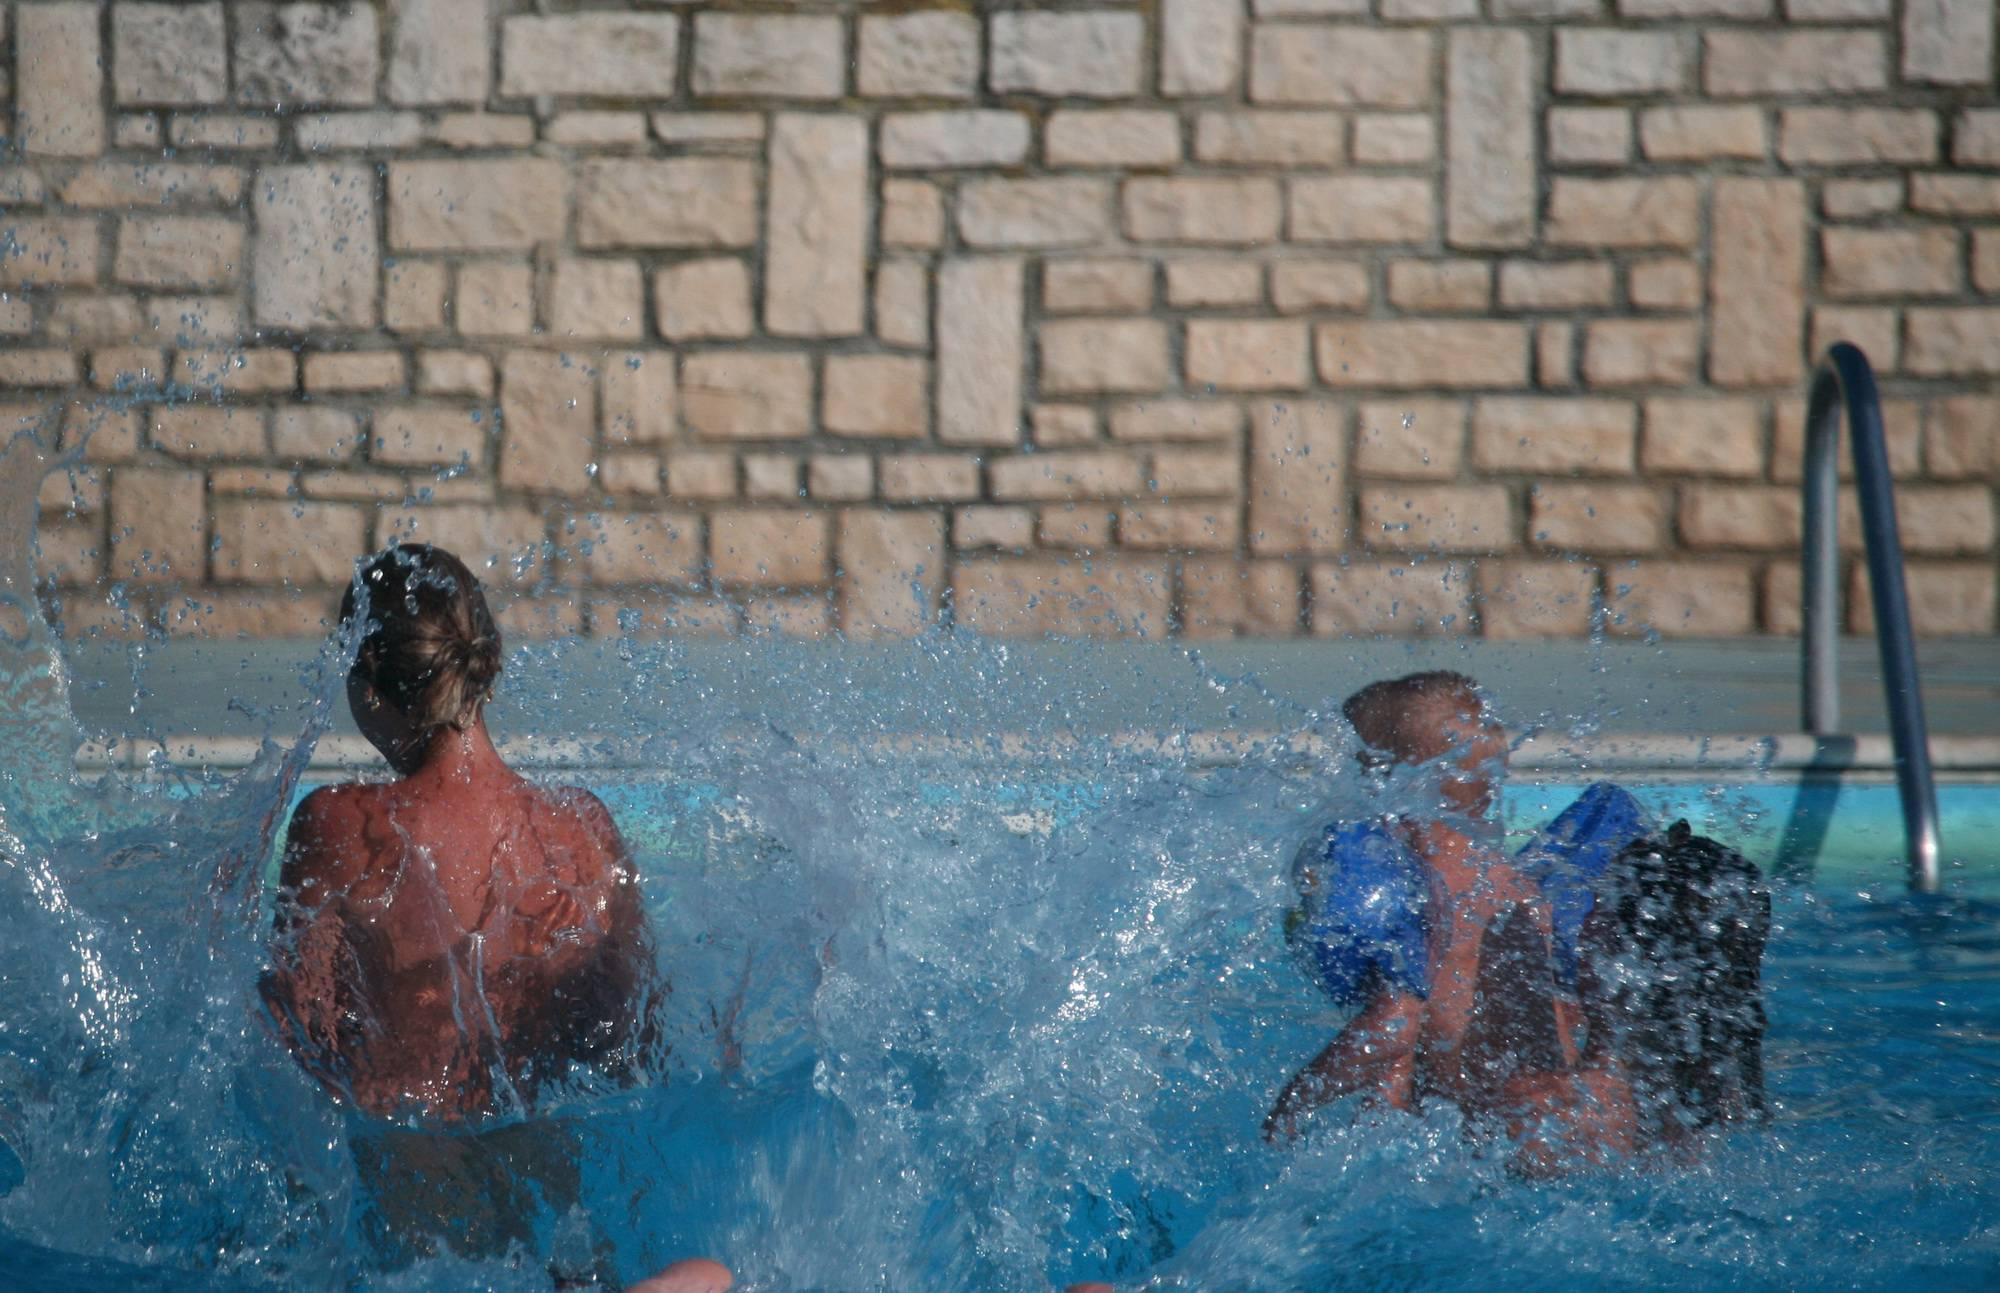 Nudist Pictures Inner Pool Nudist Activity - 1